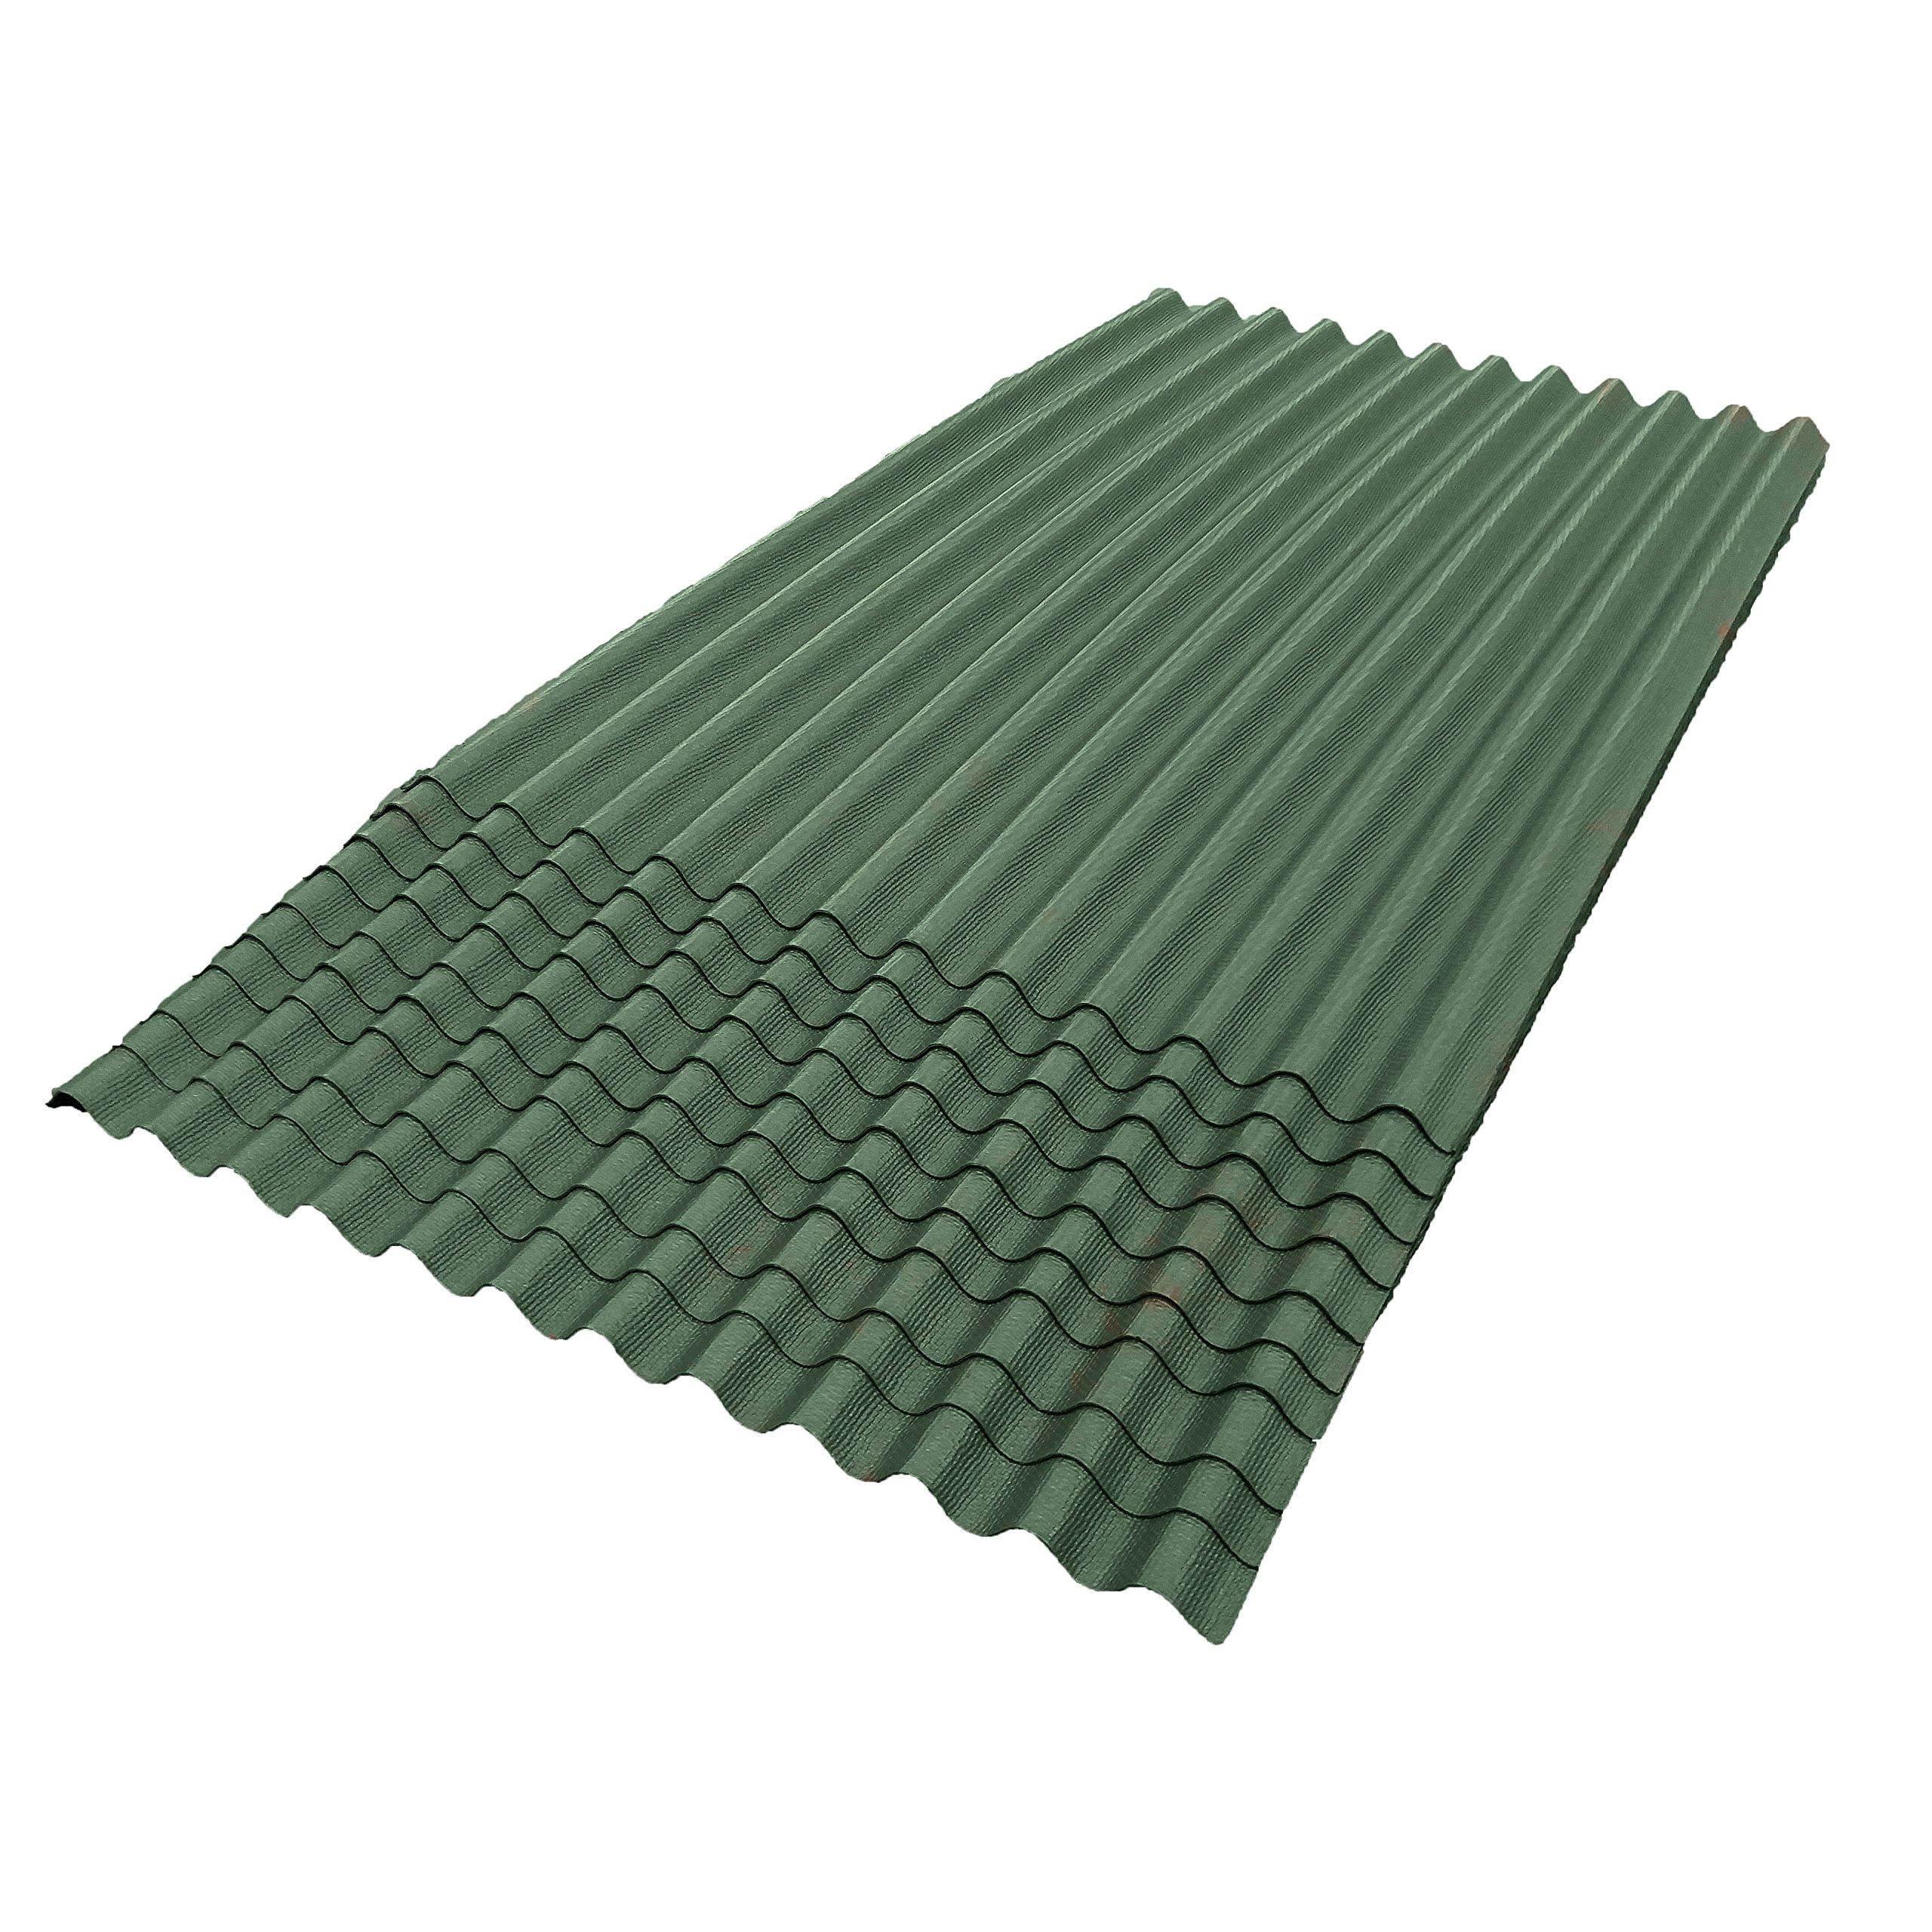 ONDURA 104 Corrugated Asphalt Roofing (10-Pack), Green by ONDURA